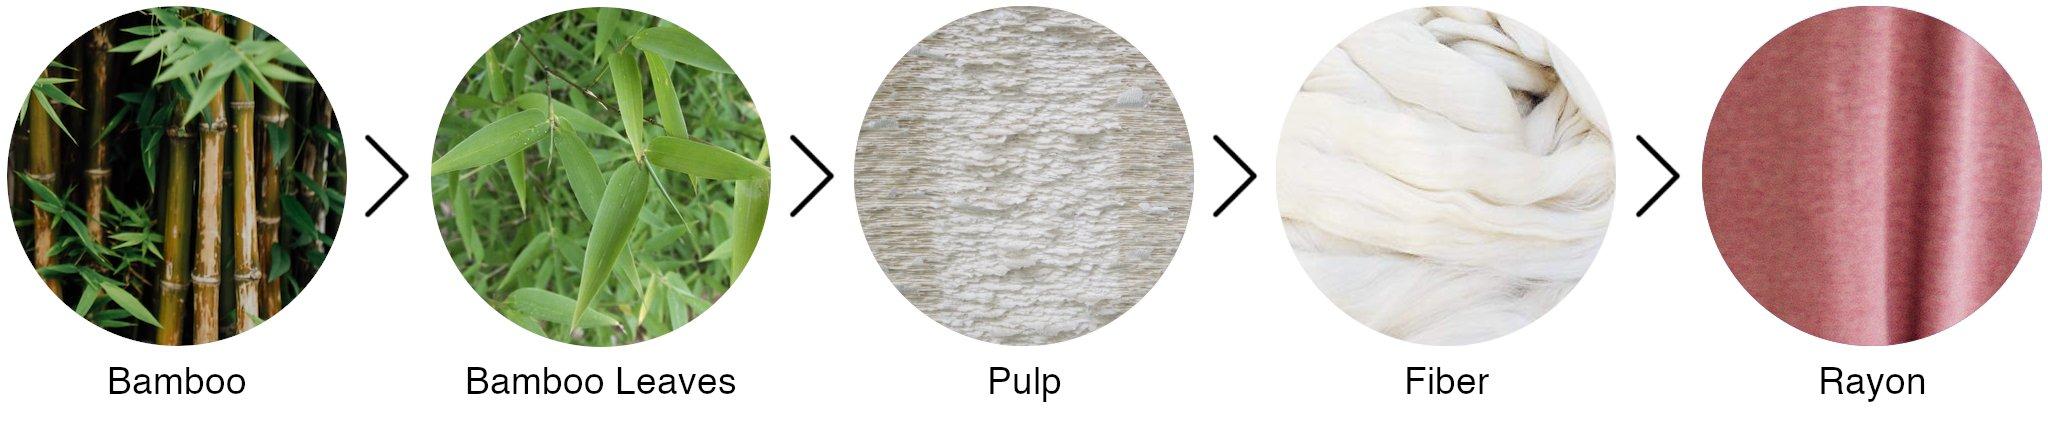 bamboo-process.jpg